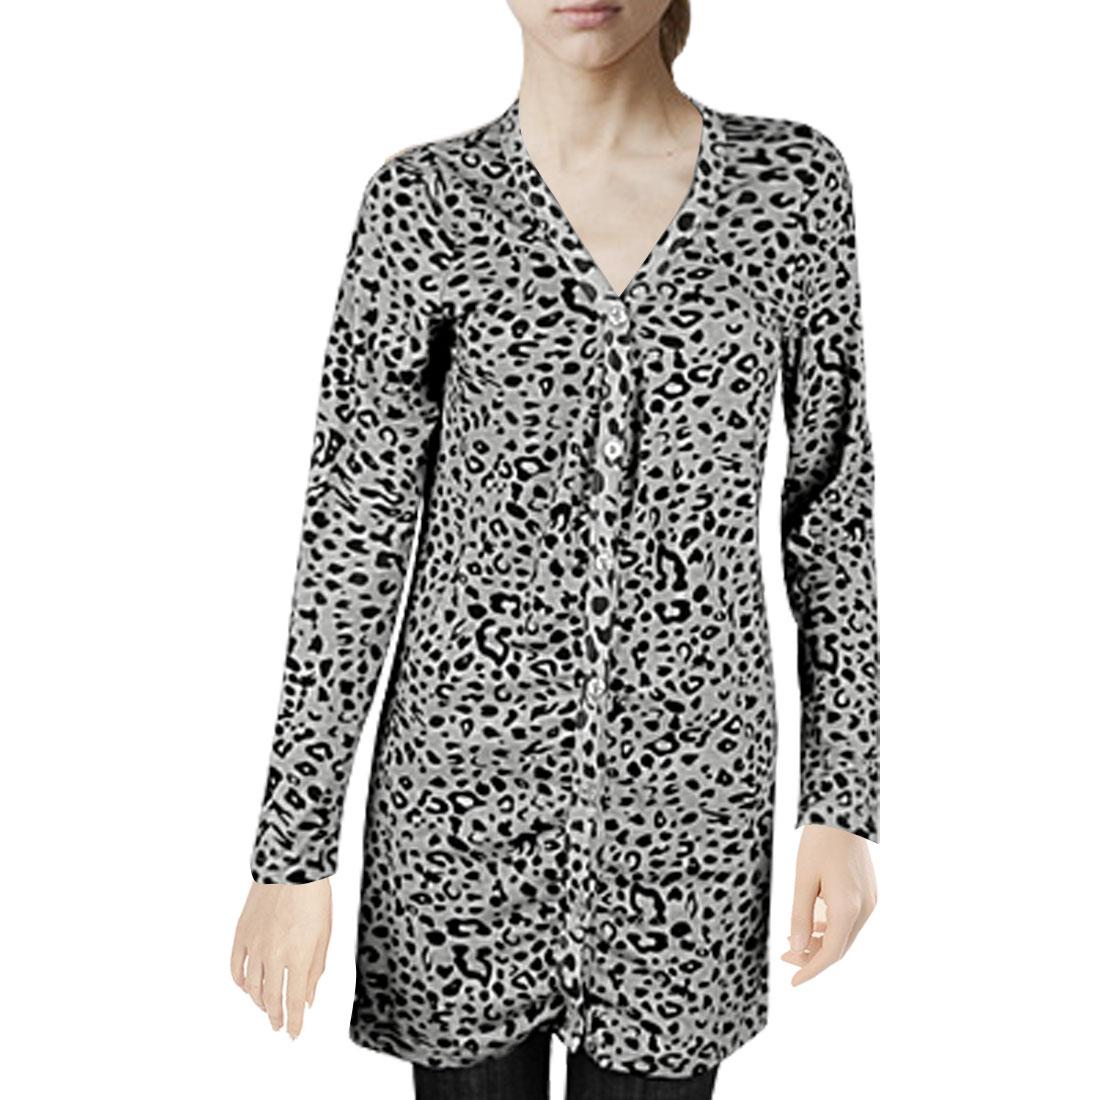 Ladies Black Leopard Printed Long Sleeves Gray Autumn Cardigan Top XS